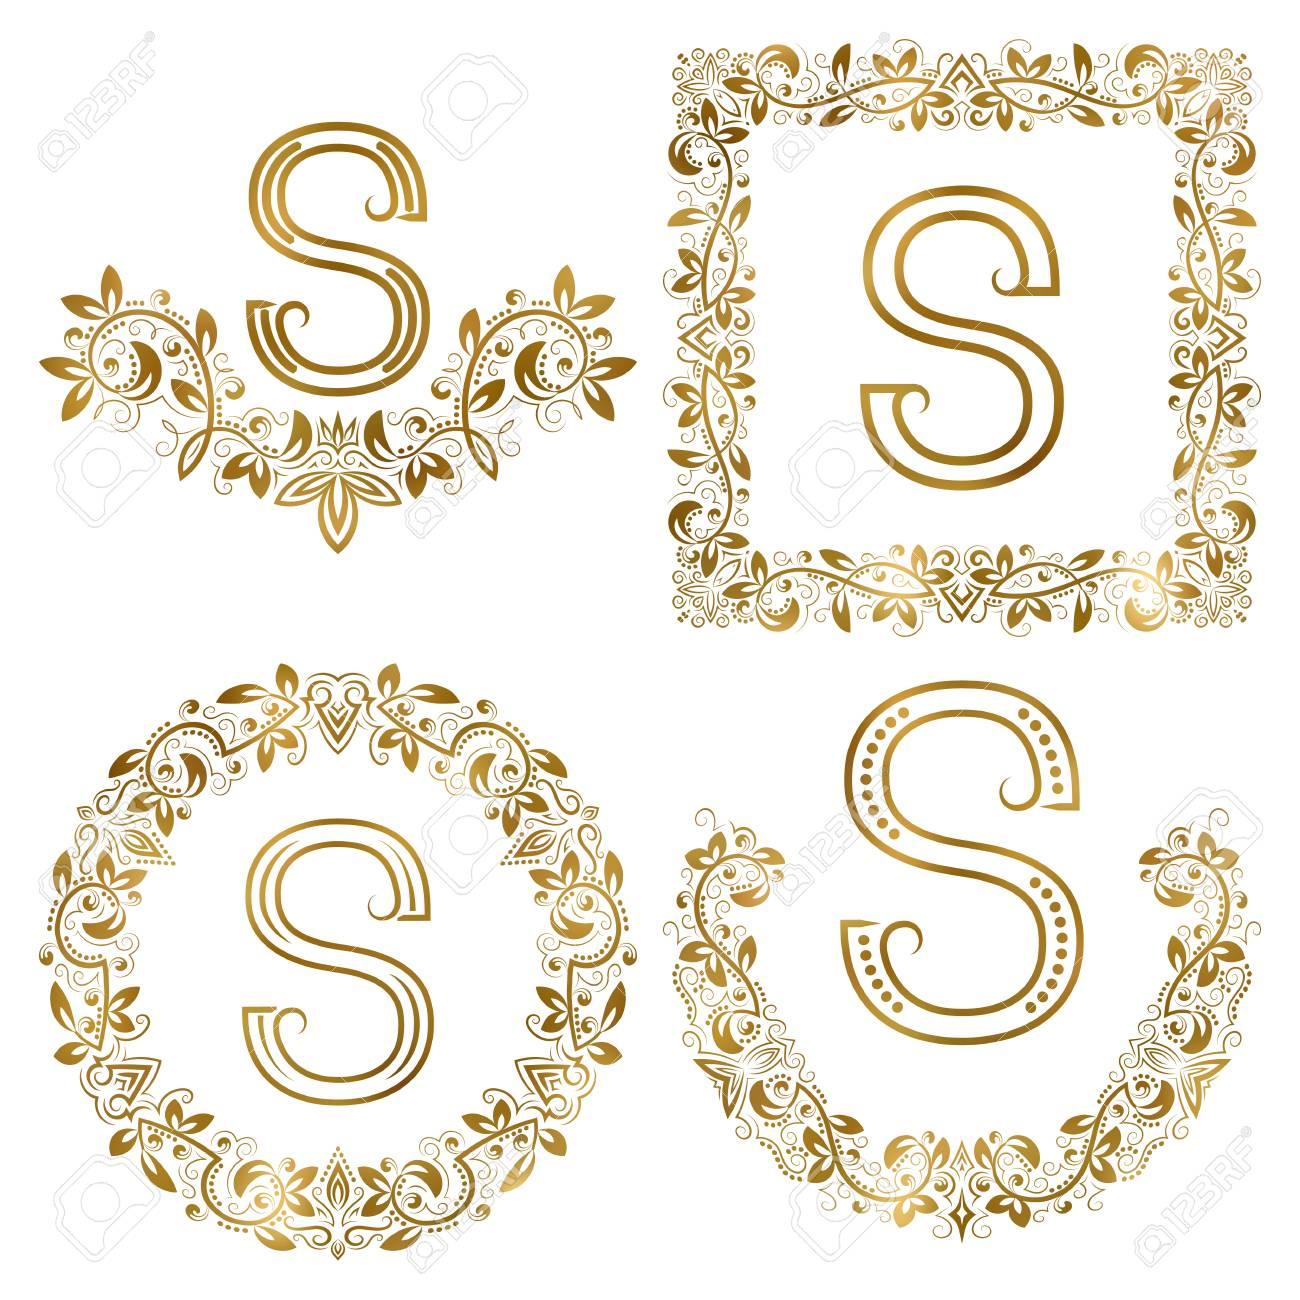 Golden S Letter Ornamental Monograms Set Heraldic Symbols In